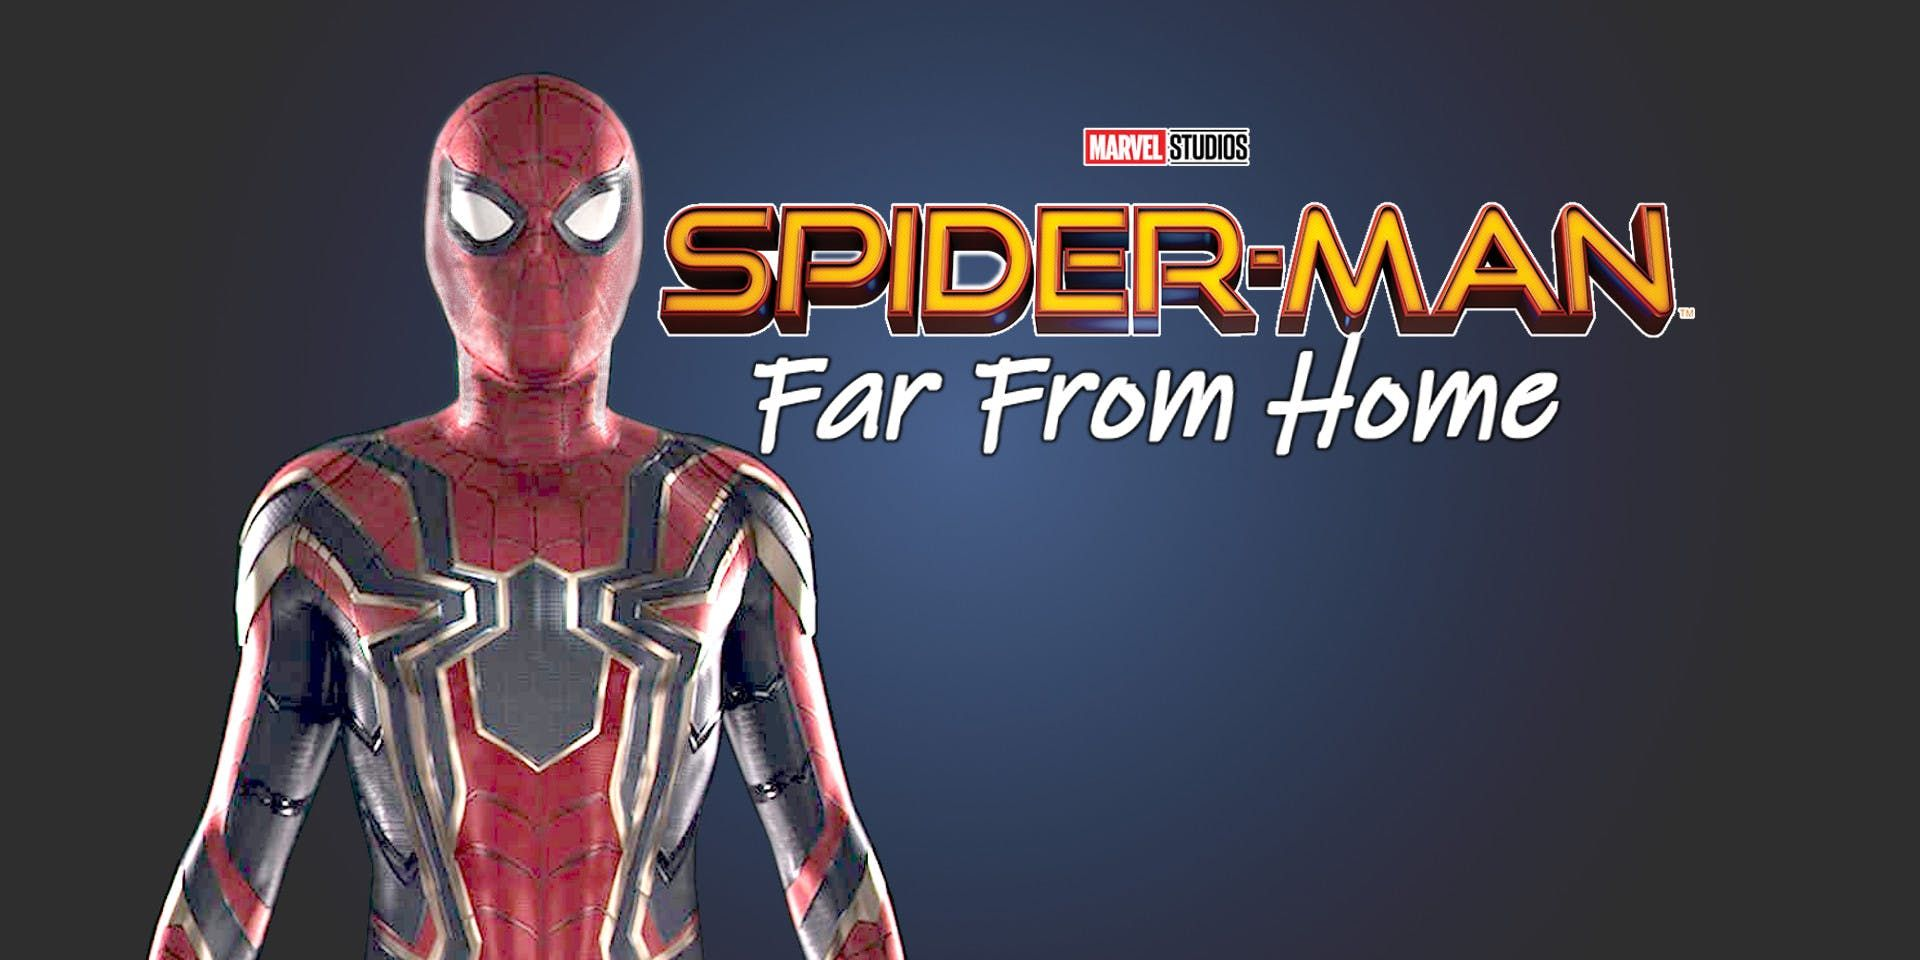 Spider Man Far From Home Full Movie Download In Tamil Dubbed Newmovies Belgiummovie Francemovie Norwaymovie Germanmov Tom Holland Peter Parker Venom Film